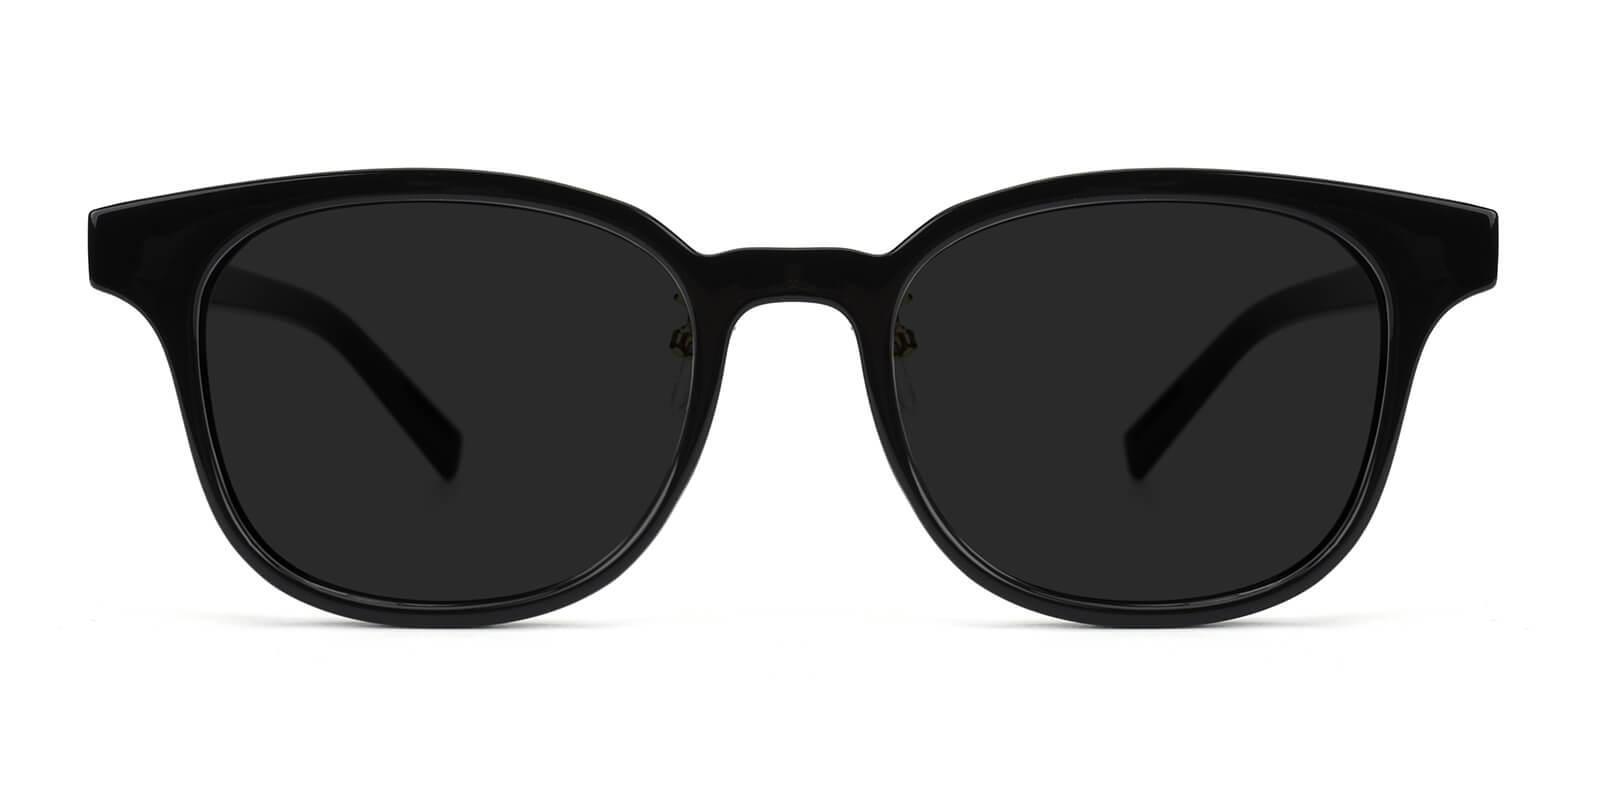 Soyok-Black-Square / Cat-TR-Sunglasses-additional2